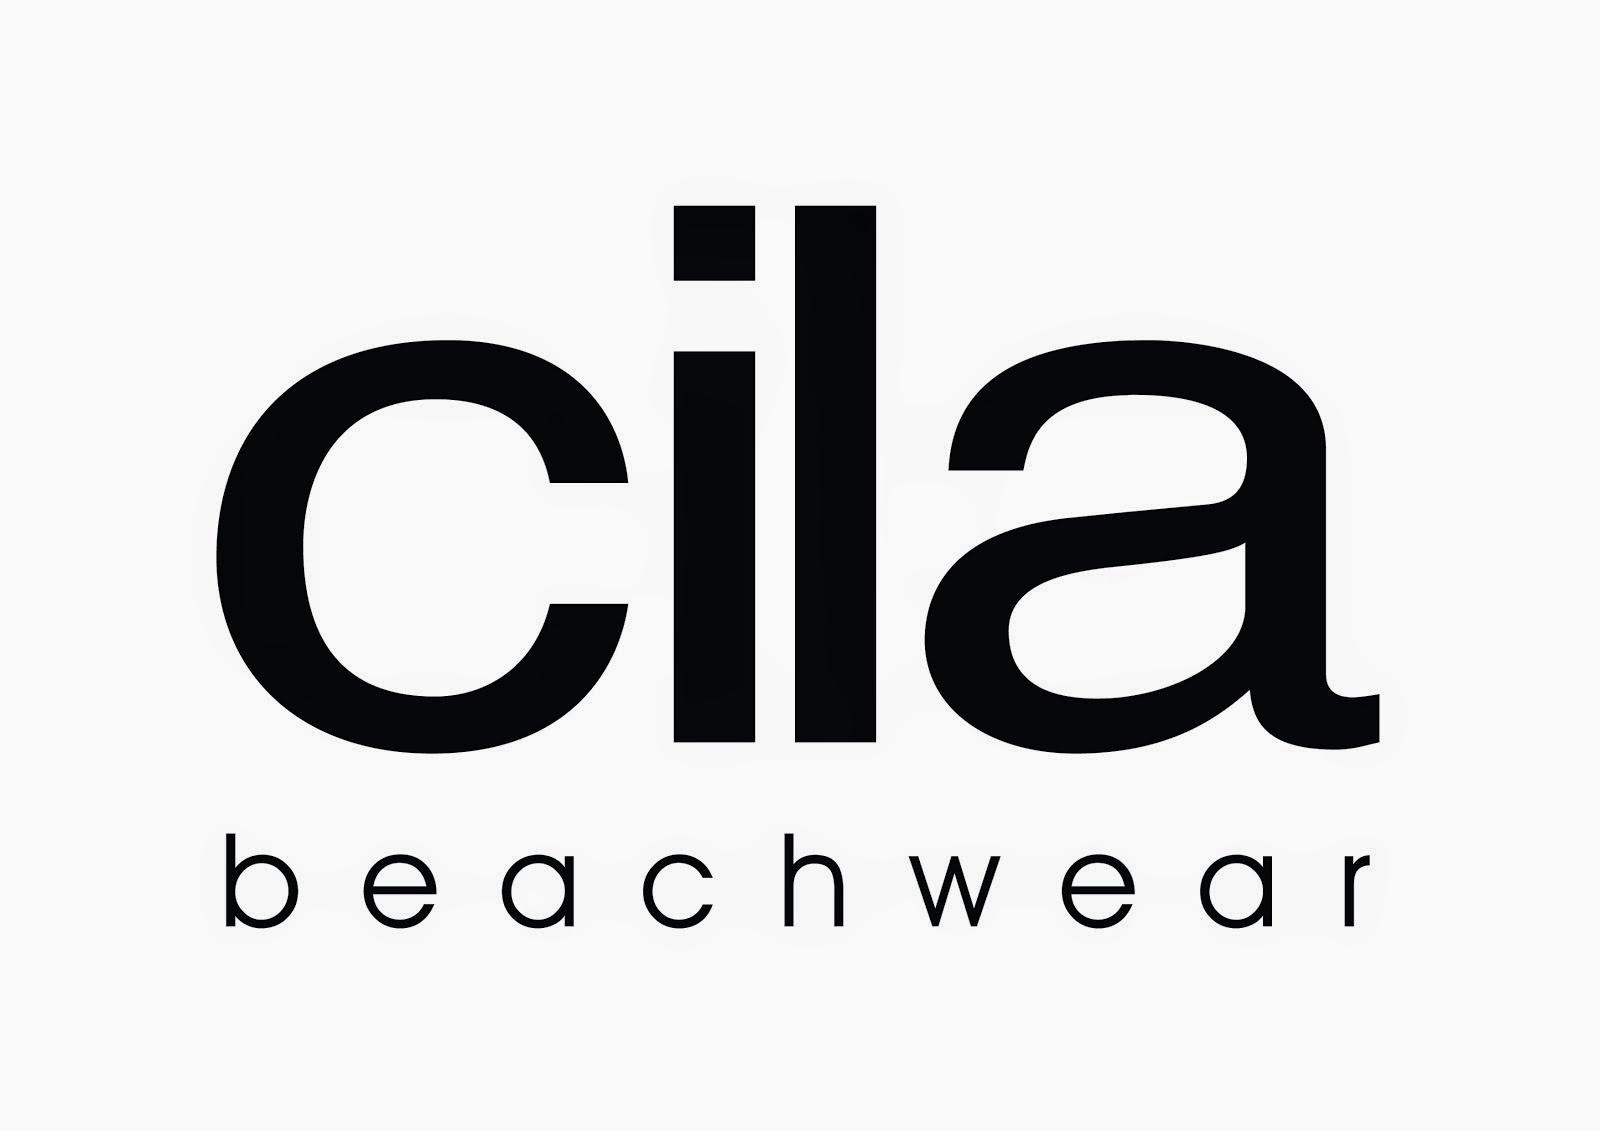 Cila beachwear